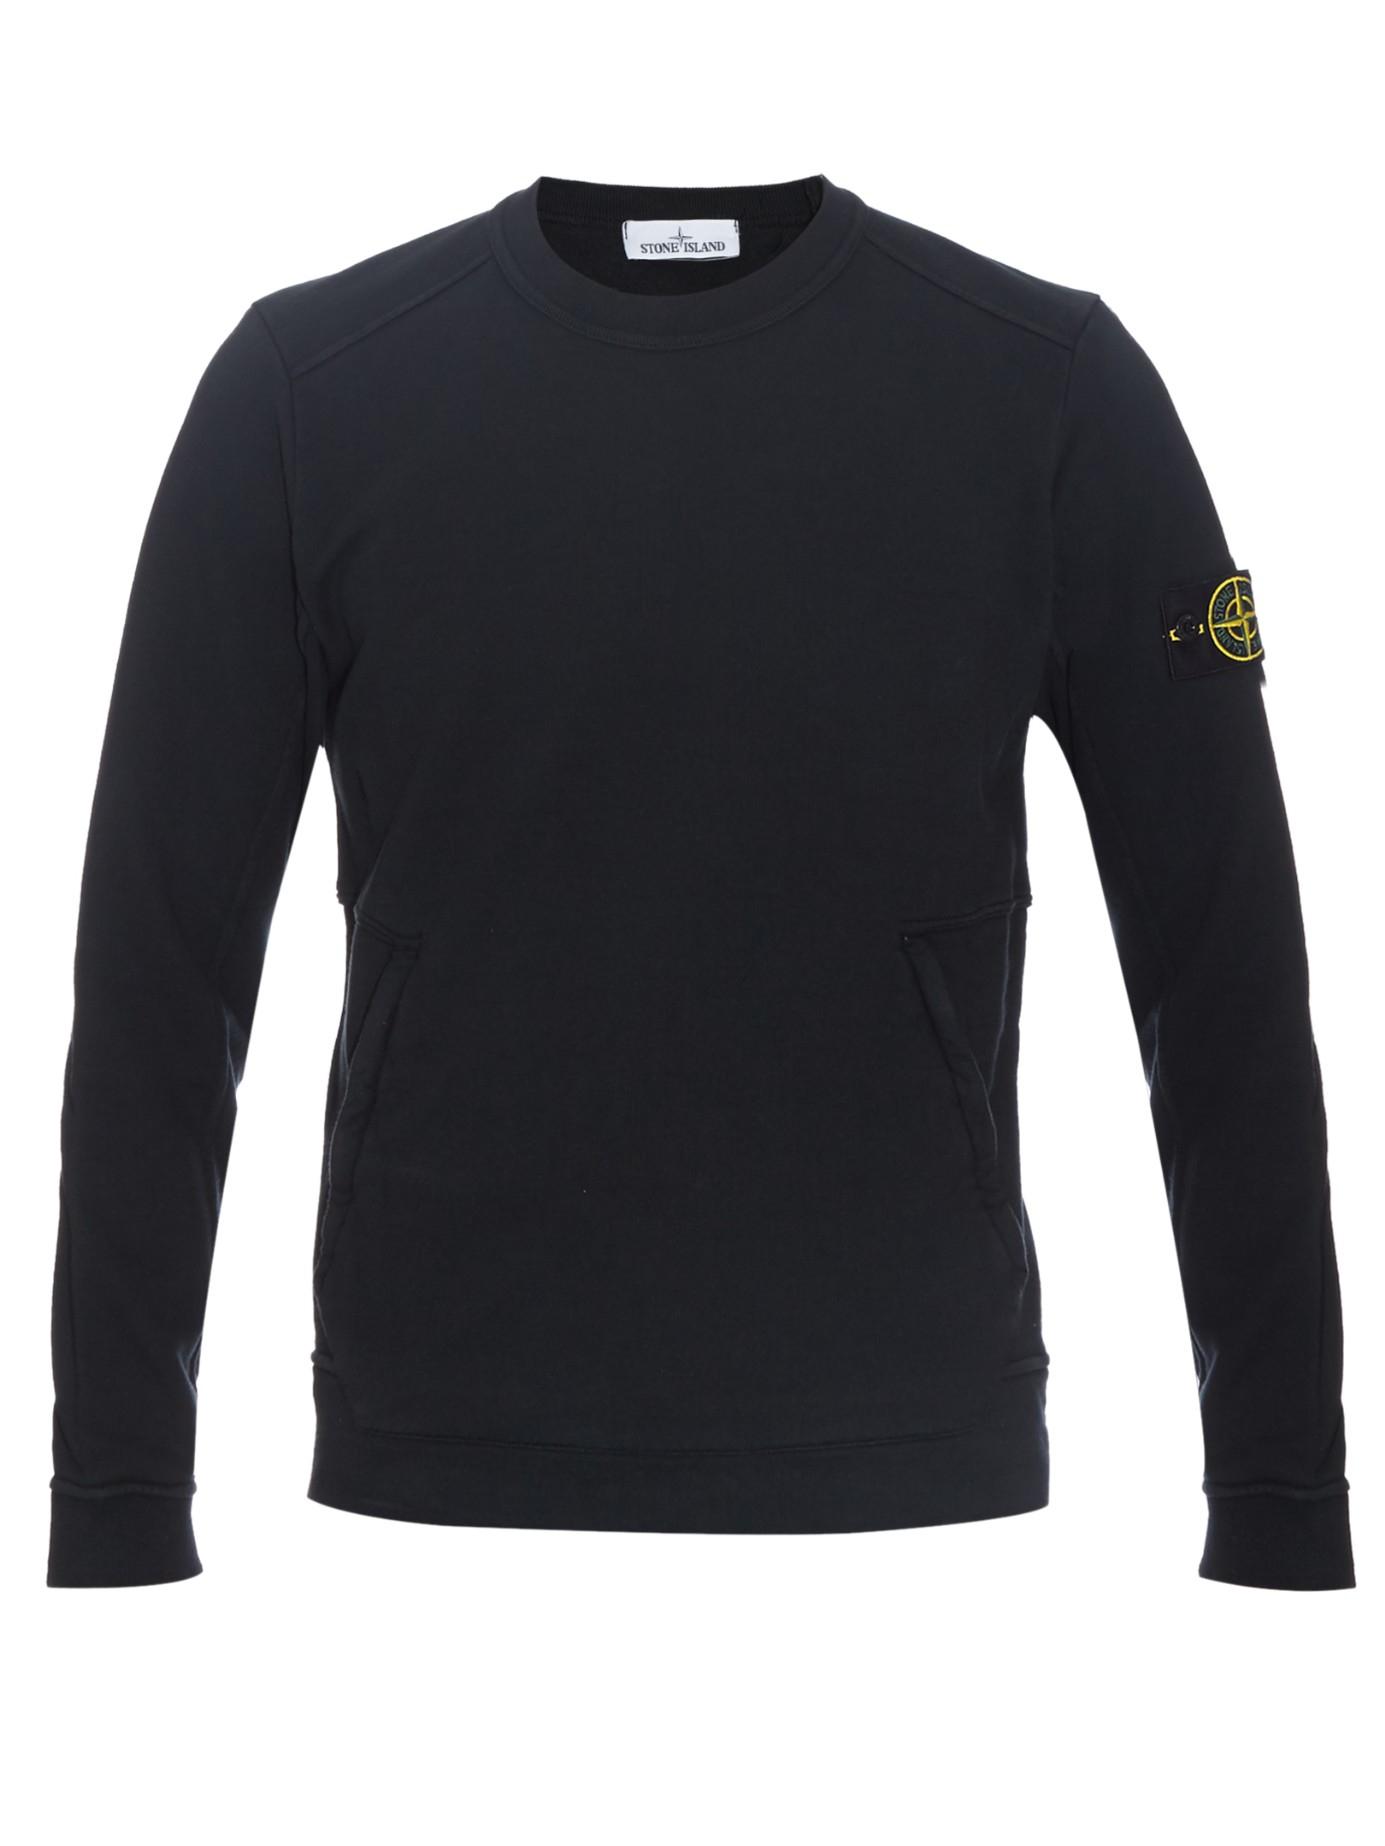 Stone island Logo-print Cotton-jersey Sweater in Black for Men | Lyst